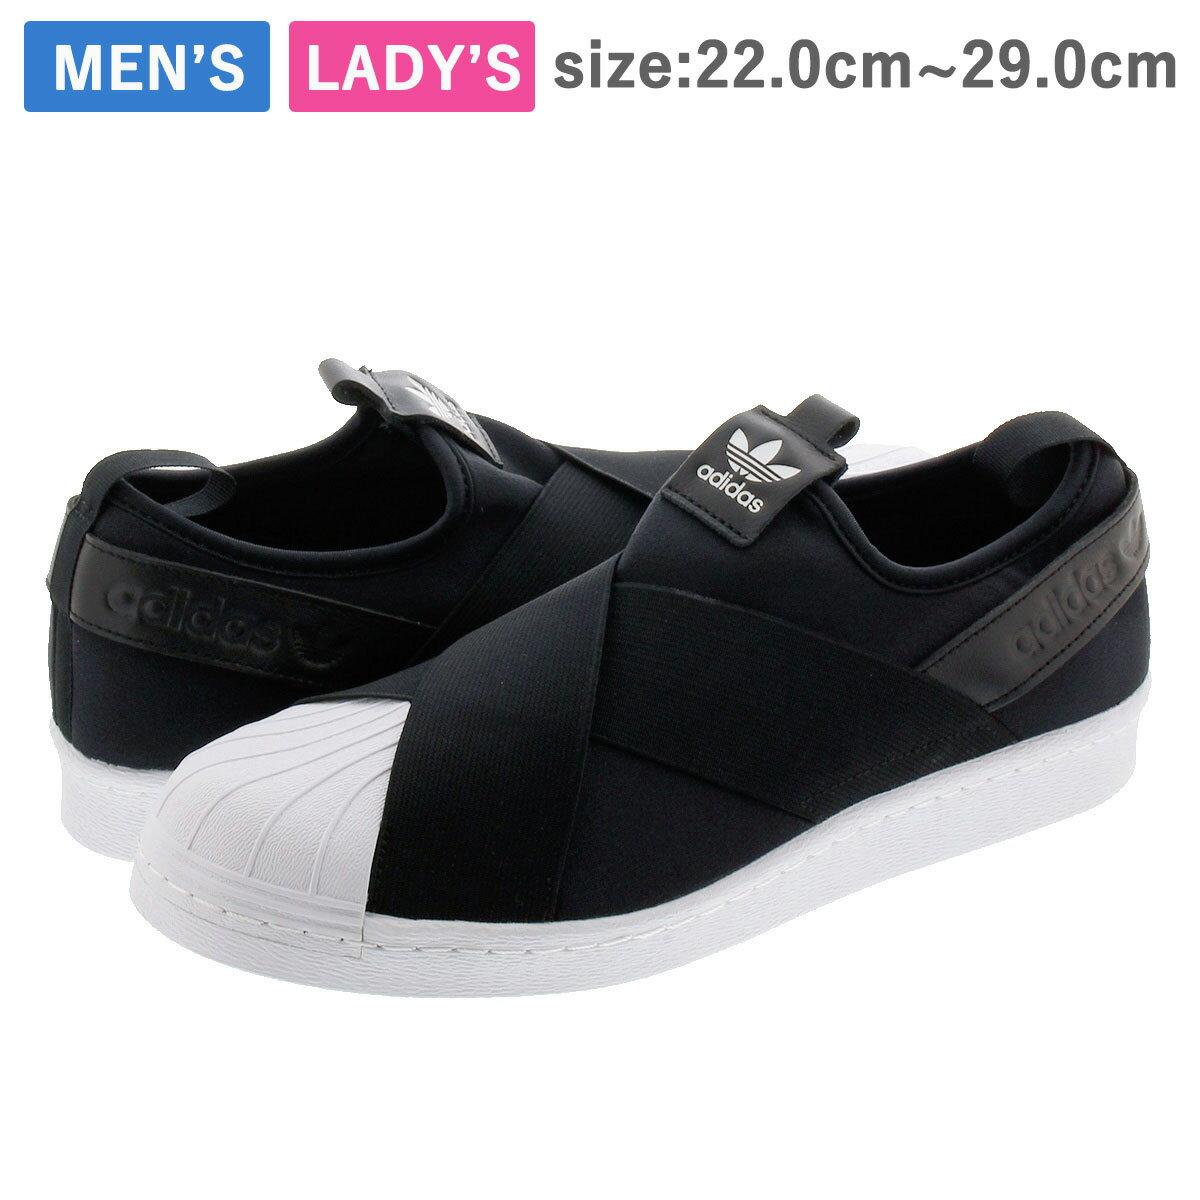 on sale 833dc d20af Adidas Superstar Slip On Price Malaysia los-granados ...